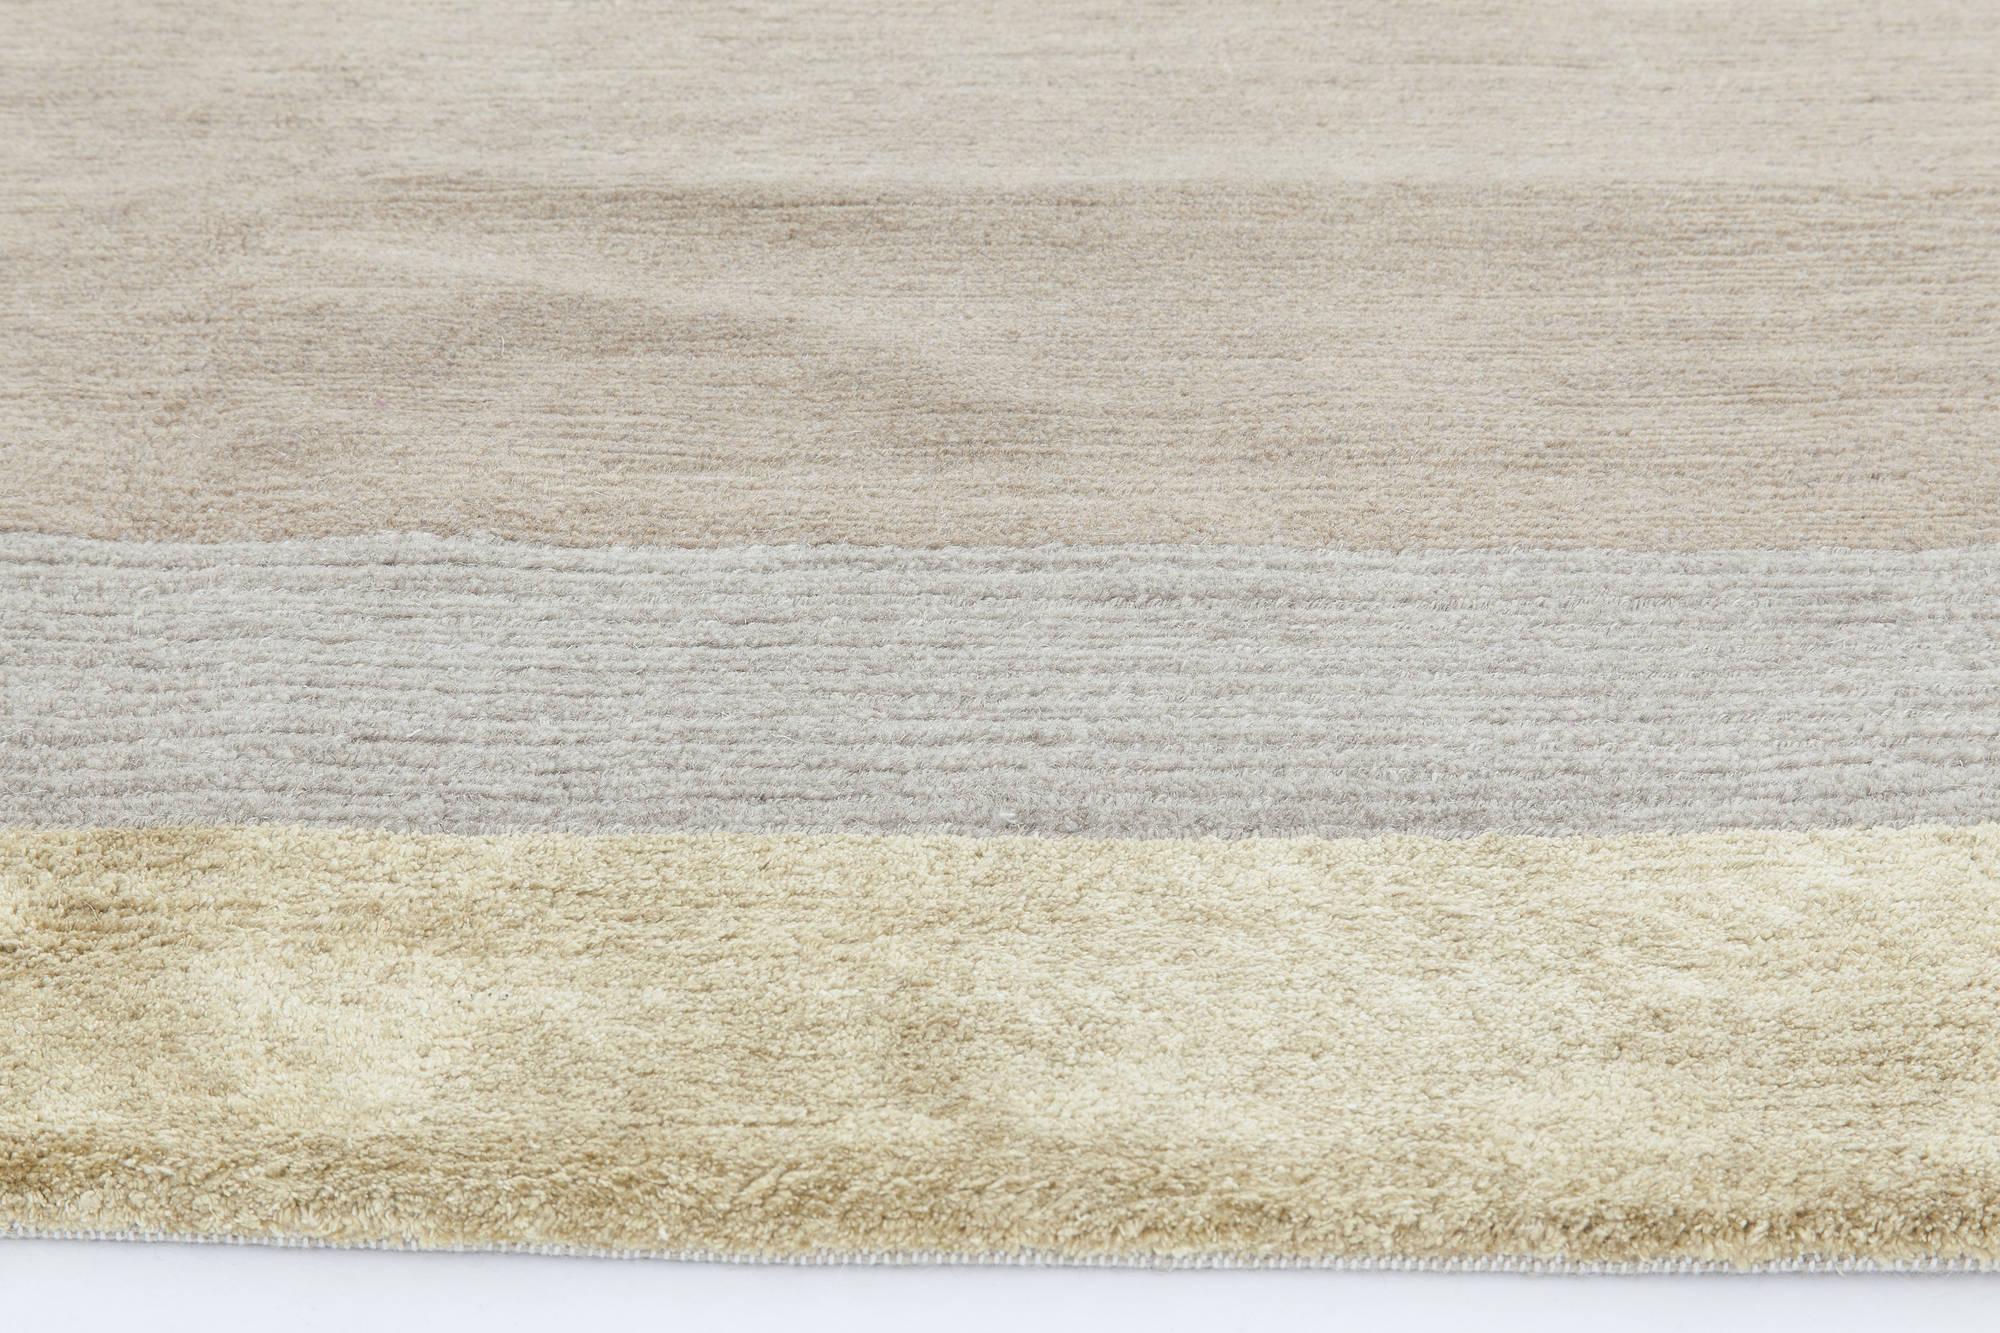 modern rug texture. Contemporary Nepalese Rug N11506 Modern Texture E